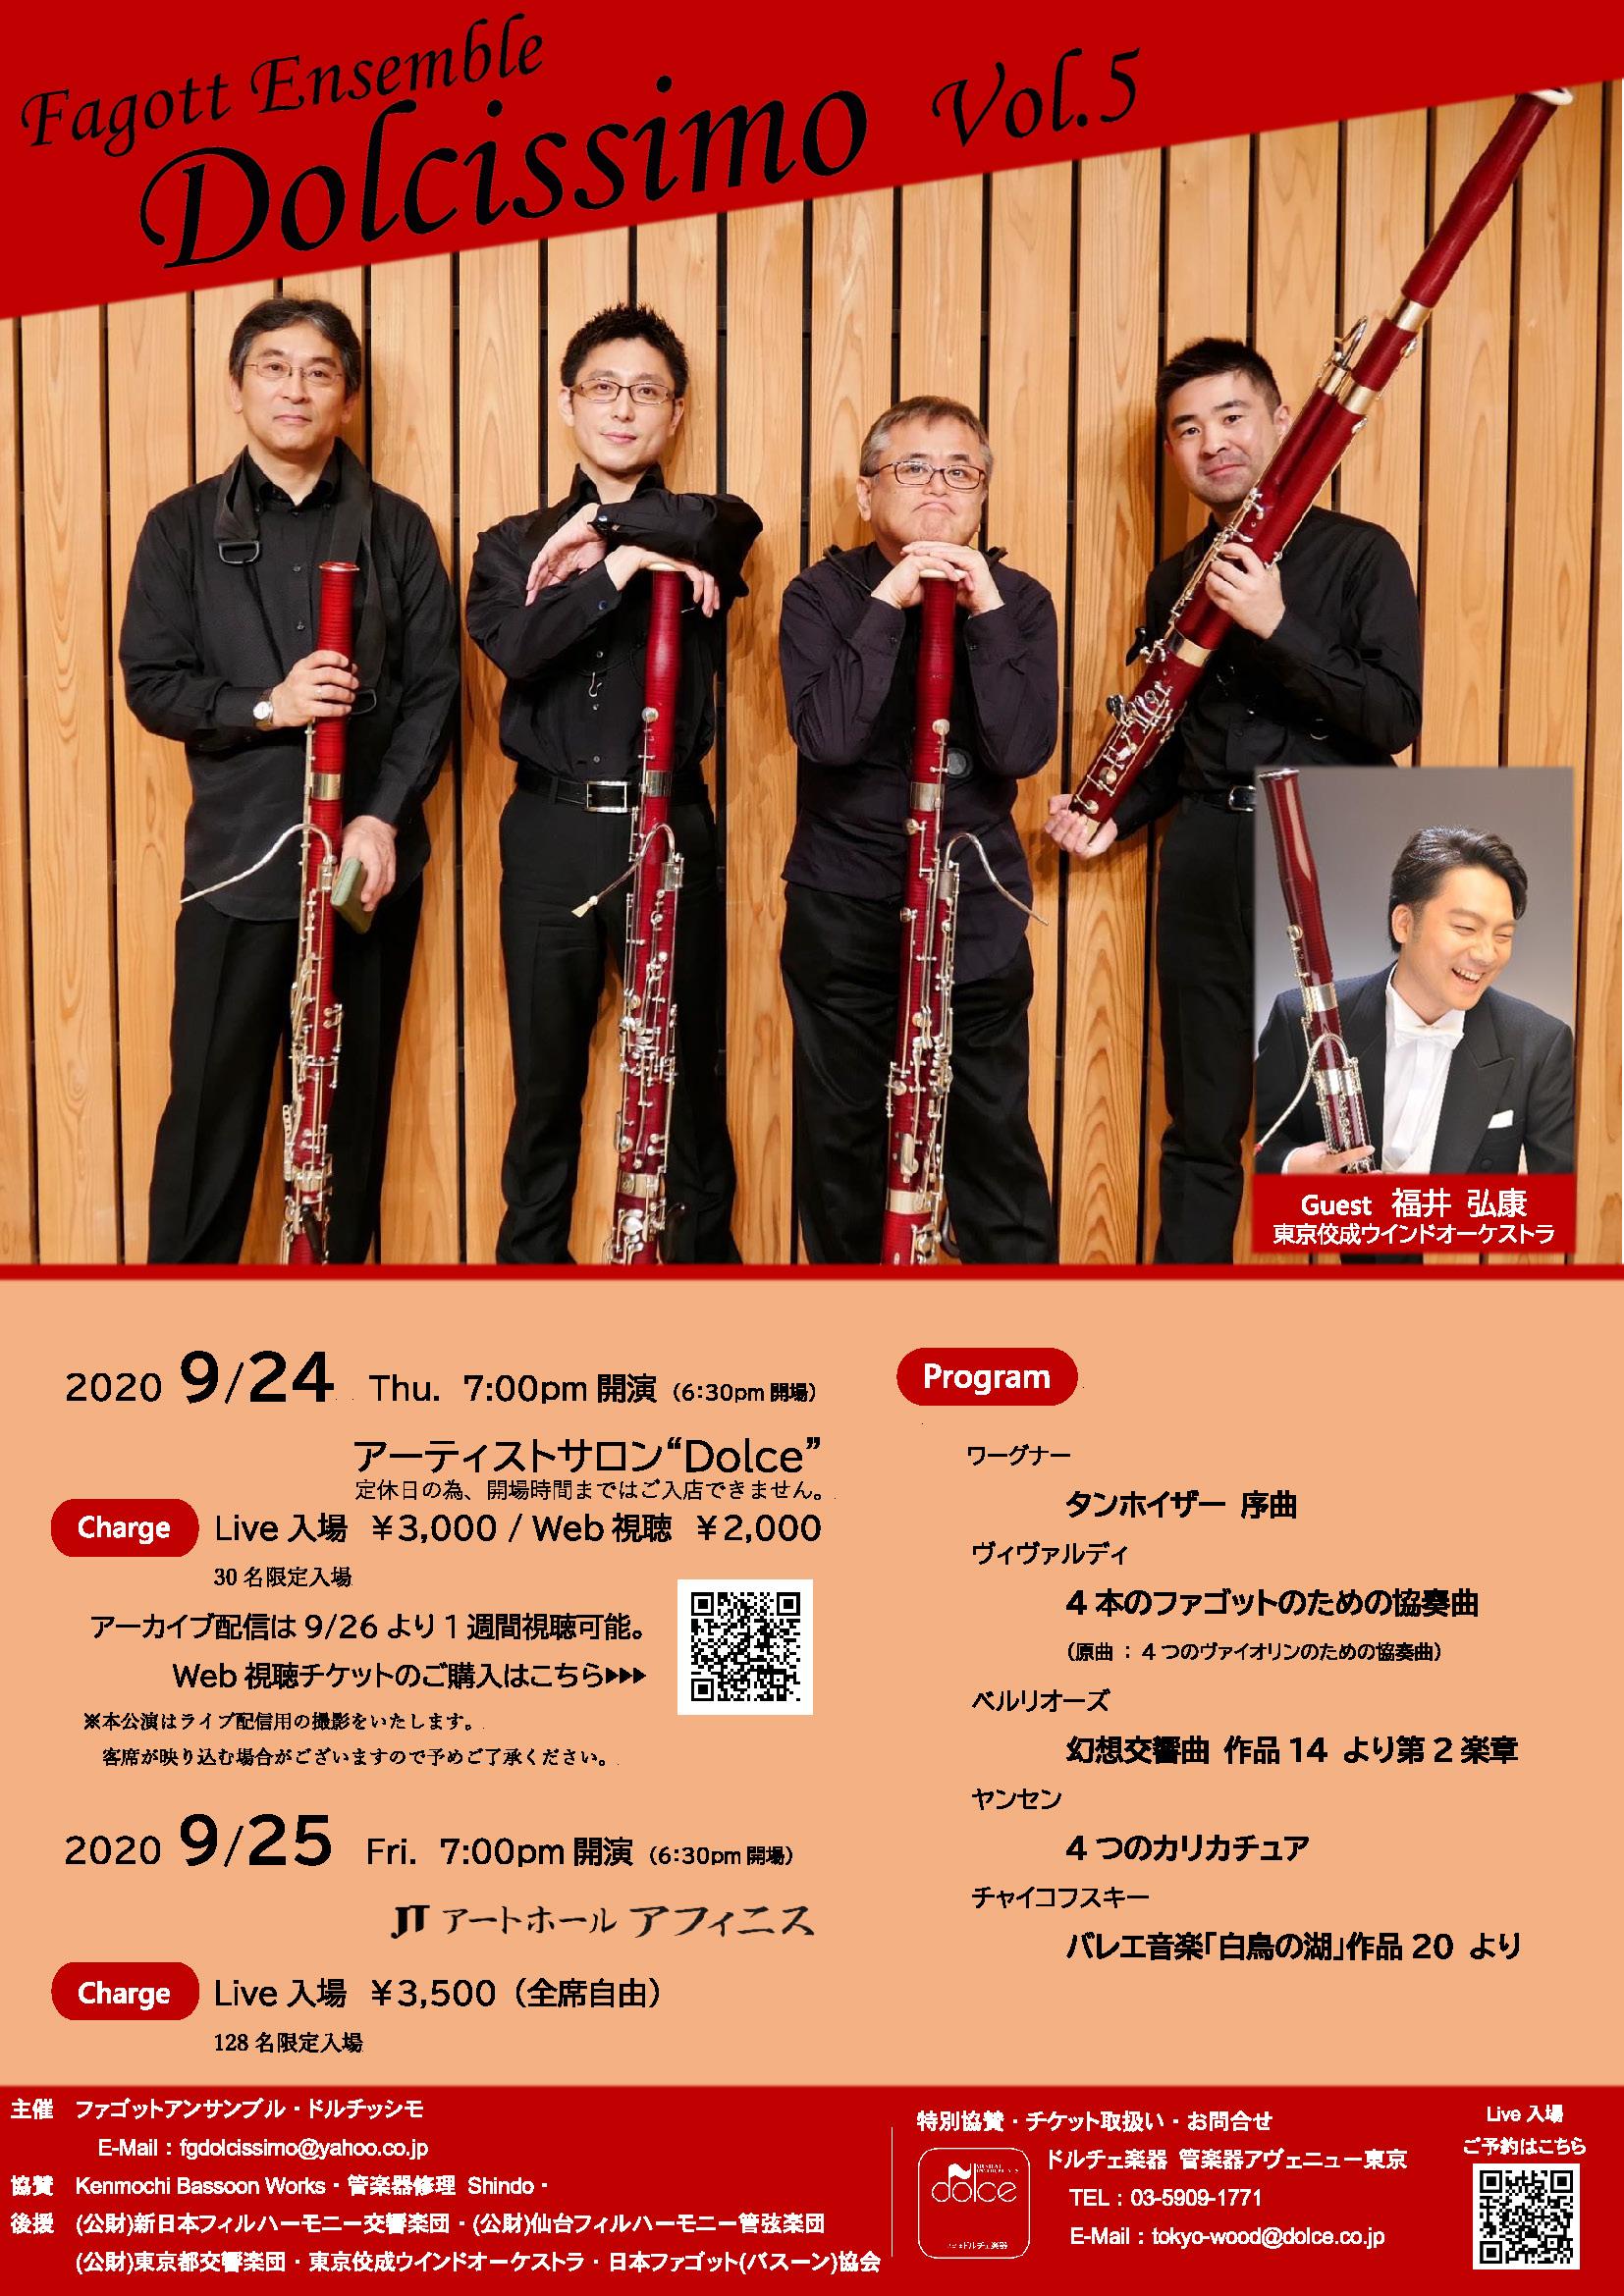 Fagott Ensemble Dolcissimo Vol5